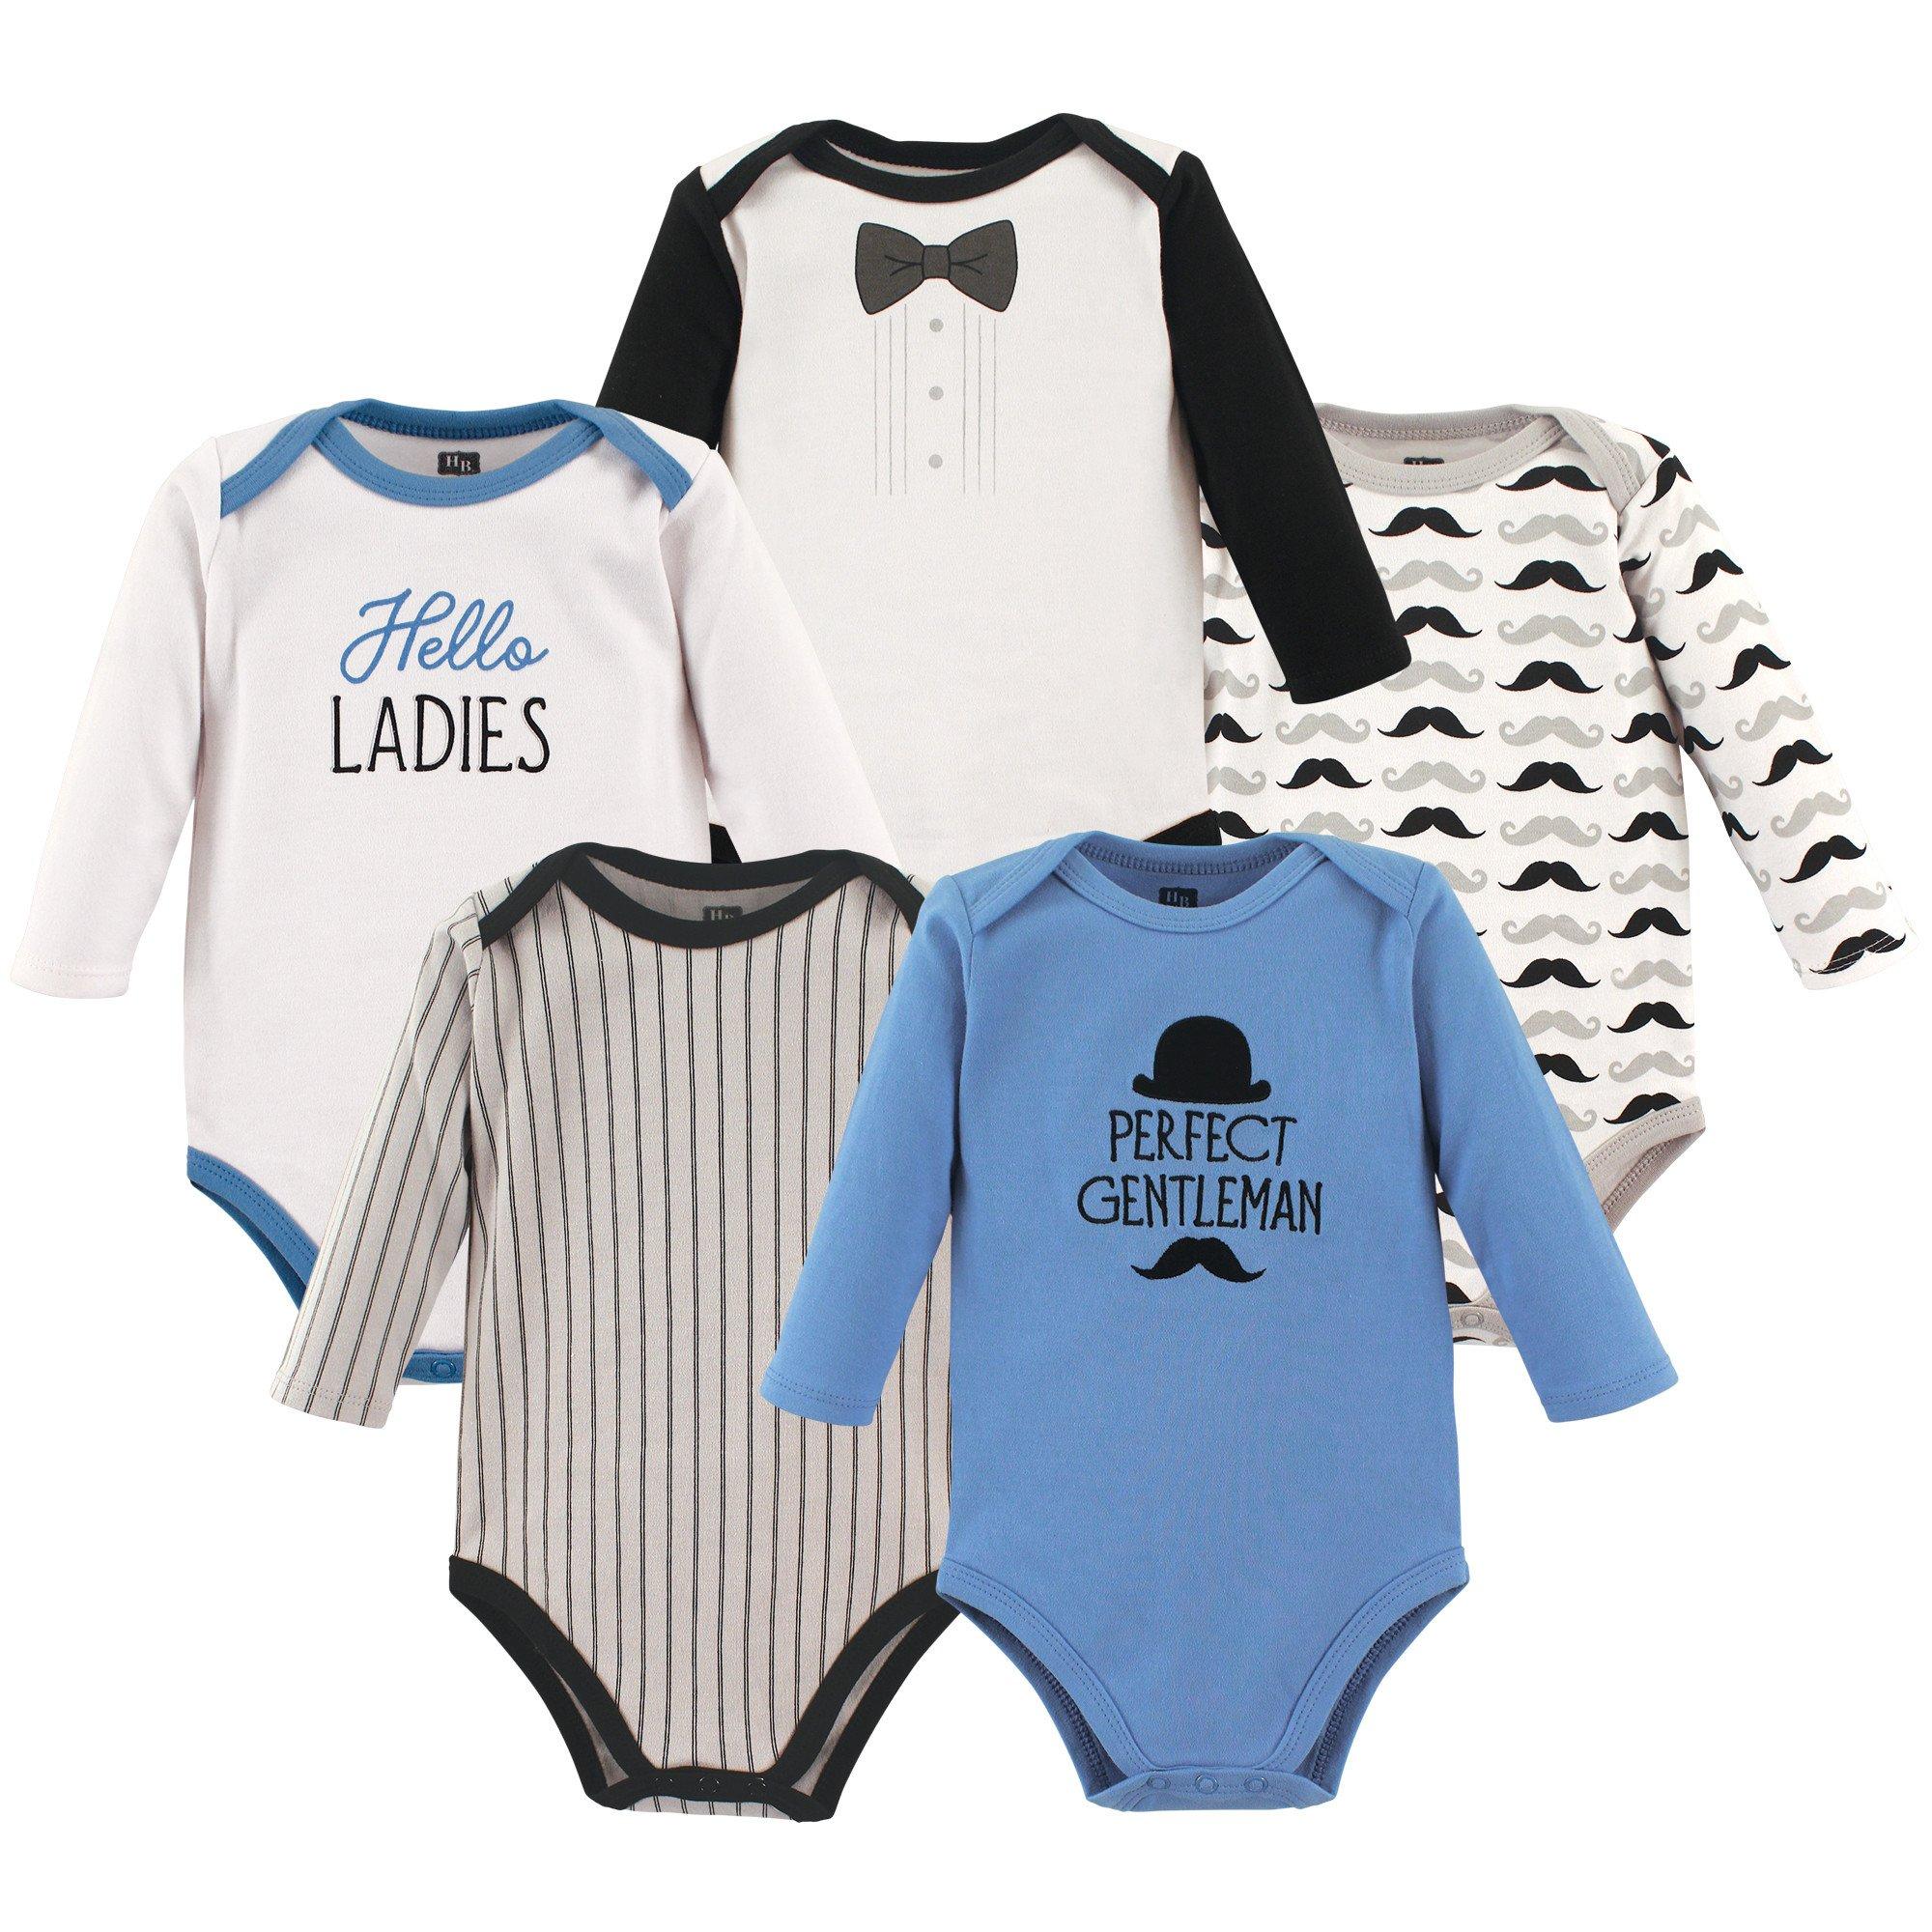 Hudson Baby Baby Long Sleeve Bodysuit 5 Pack, Perfect Gentleman, 9-12 Months